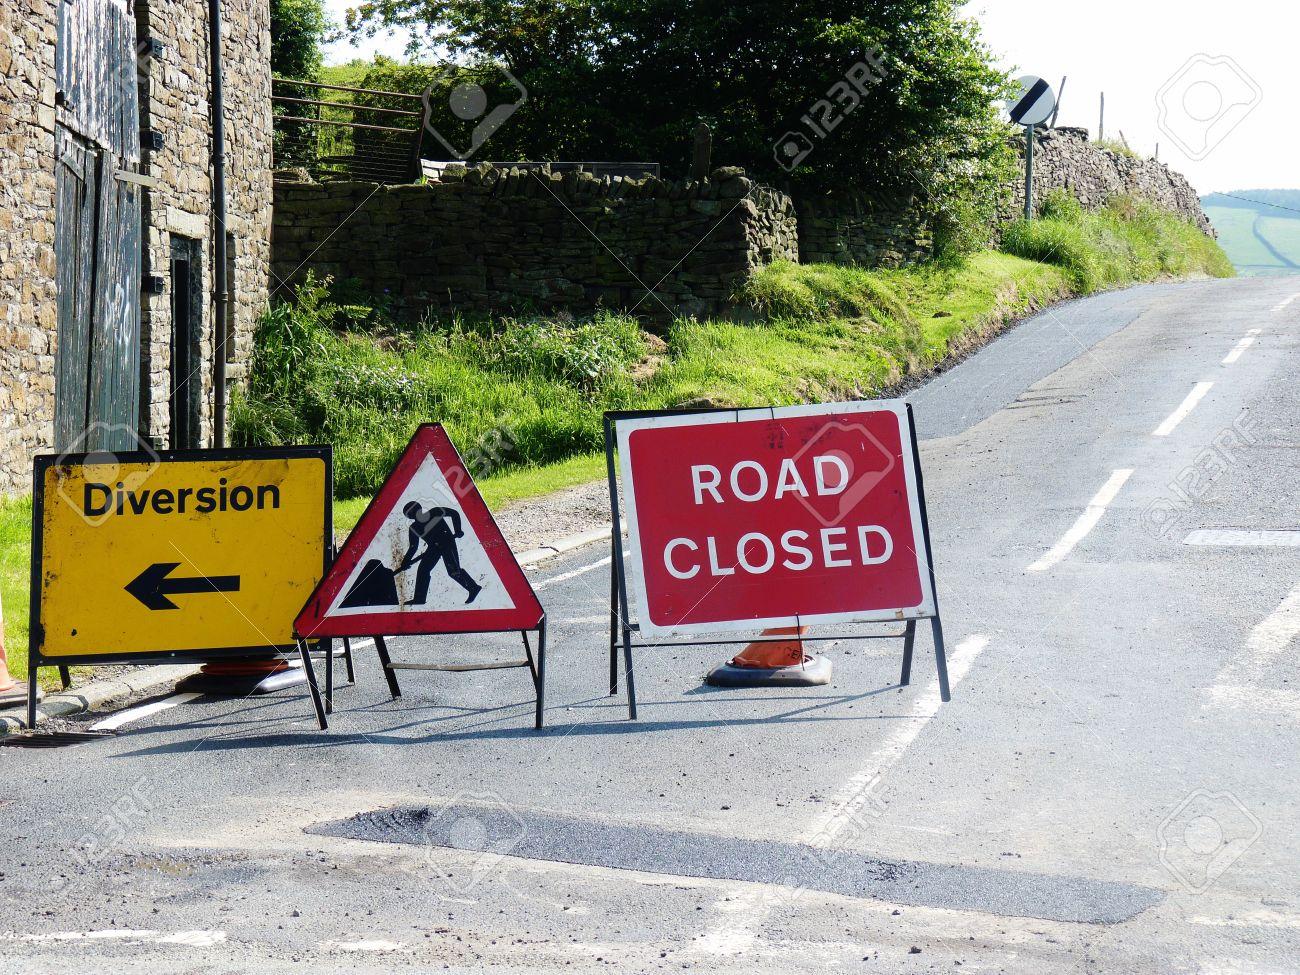 roadworks signs closed diversion road - 54101373